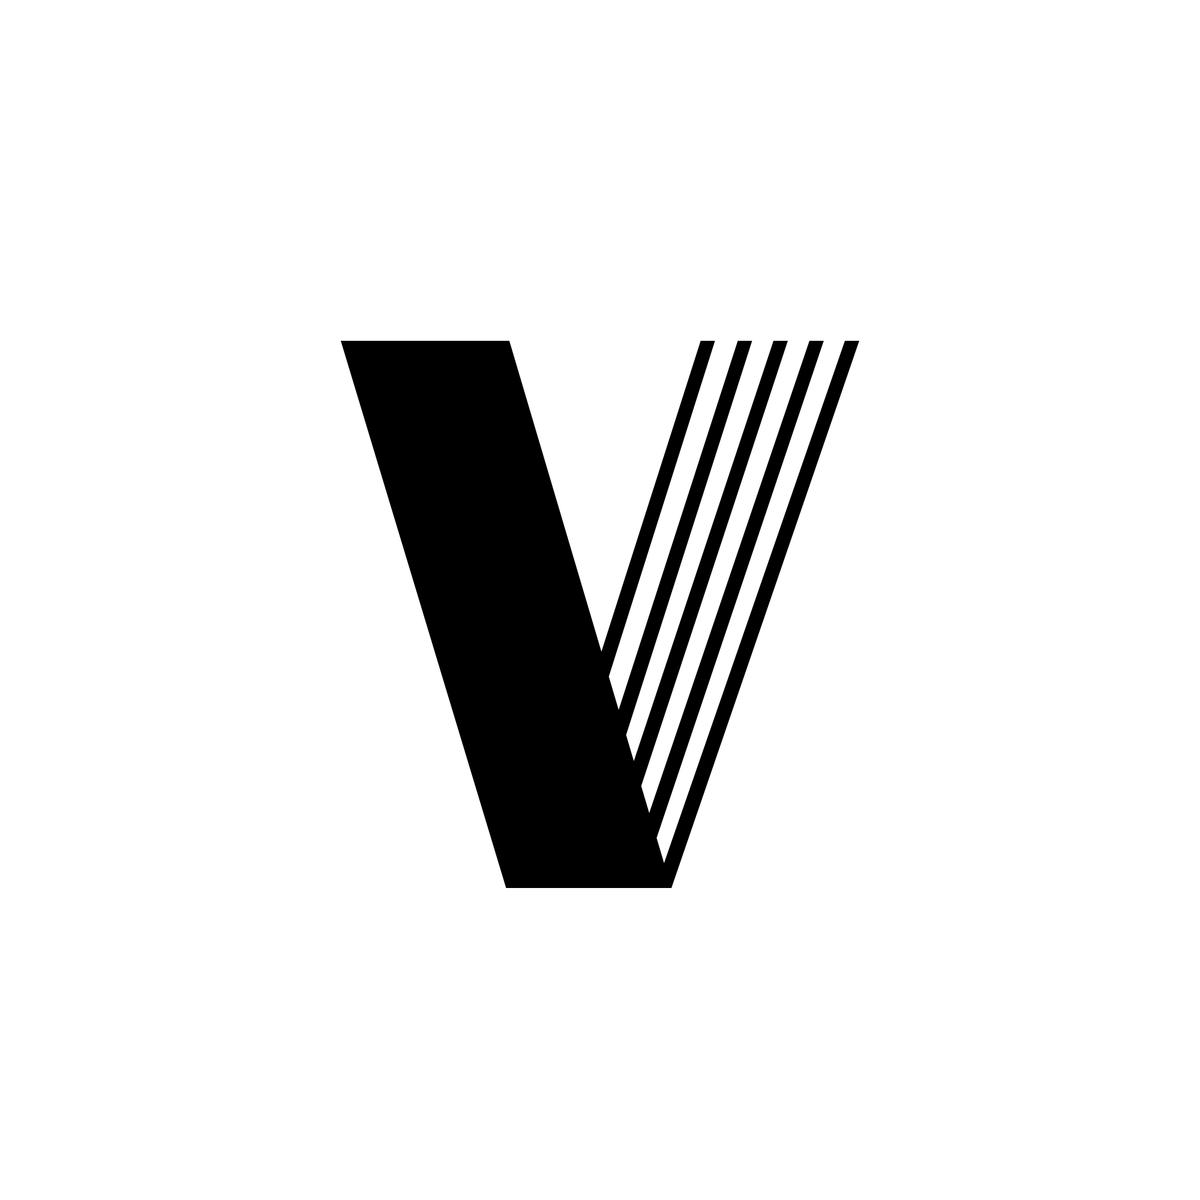 Valendo Logo Svg In 2020 V Logo Design Letter Logo Design Typographic Logo